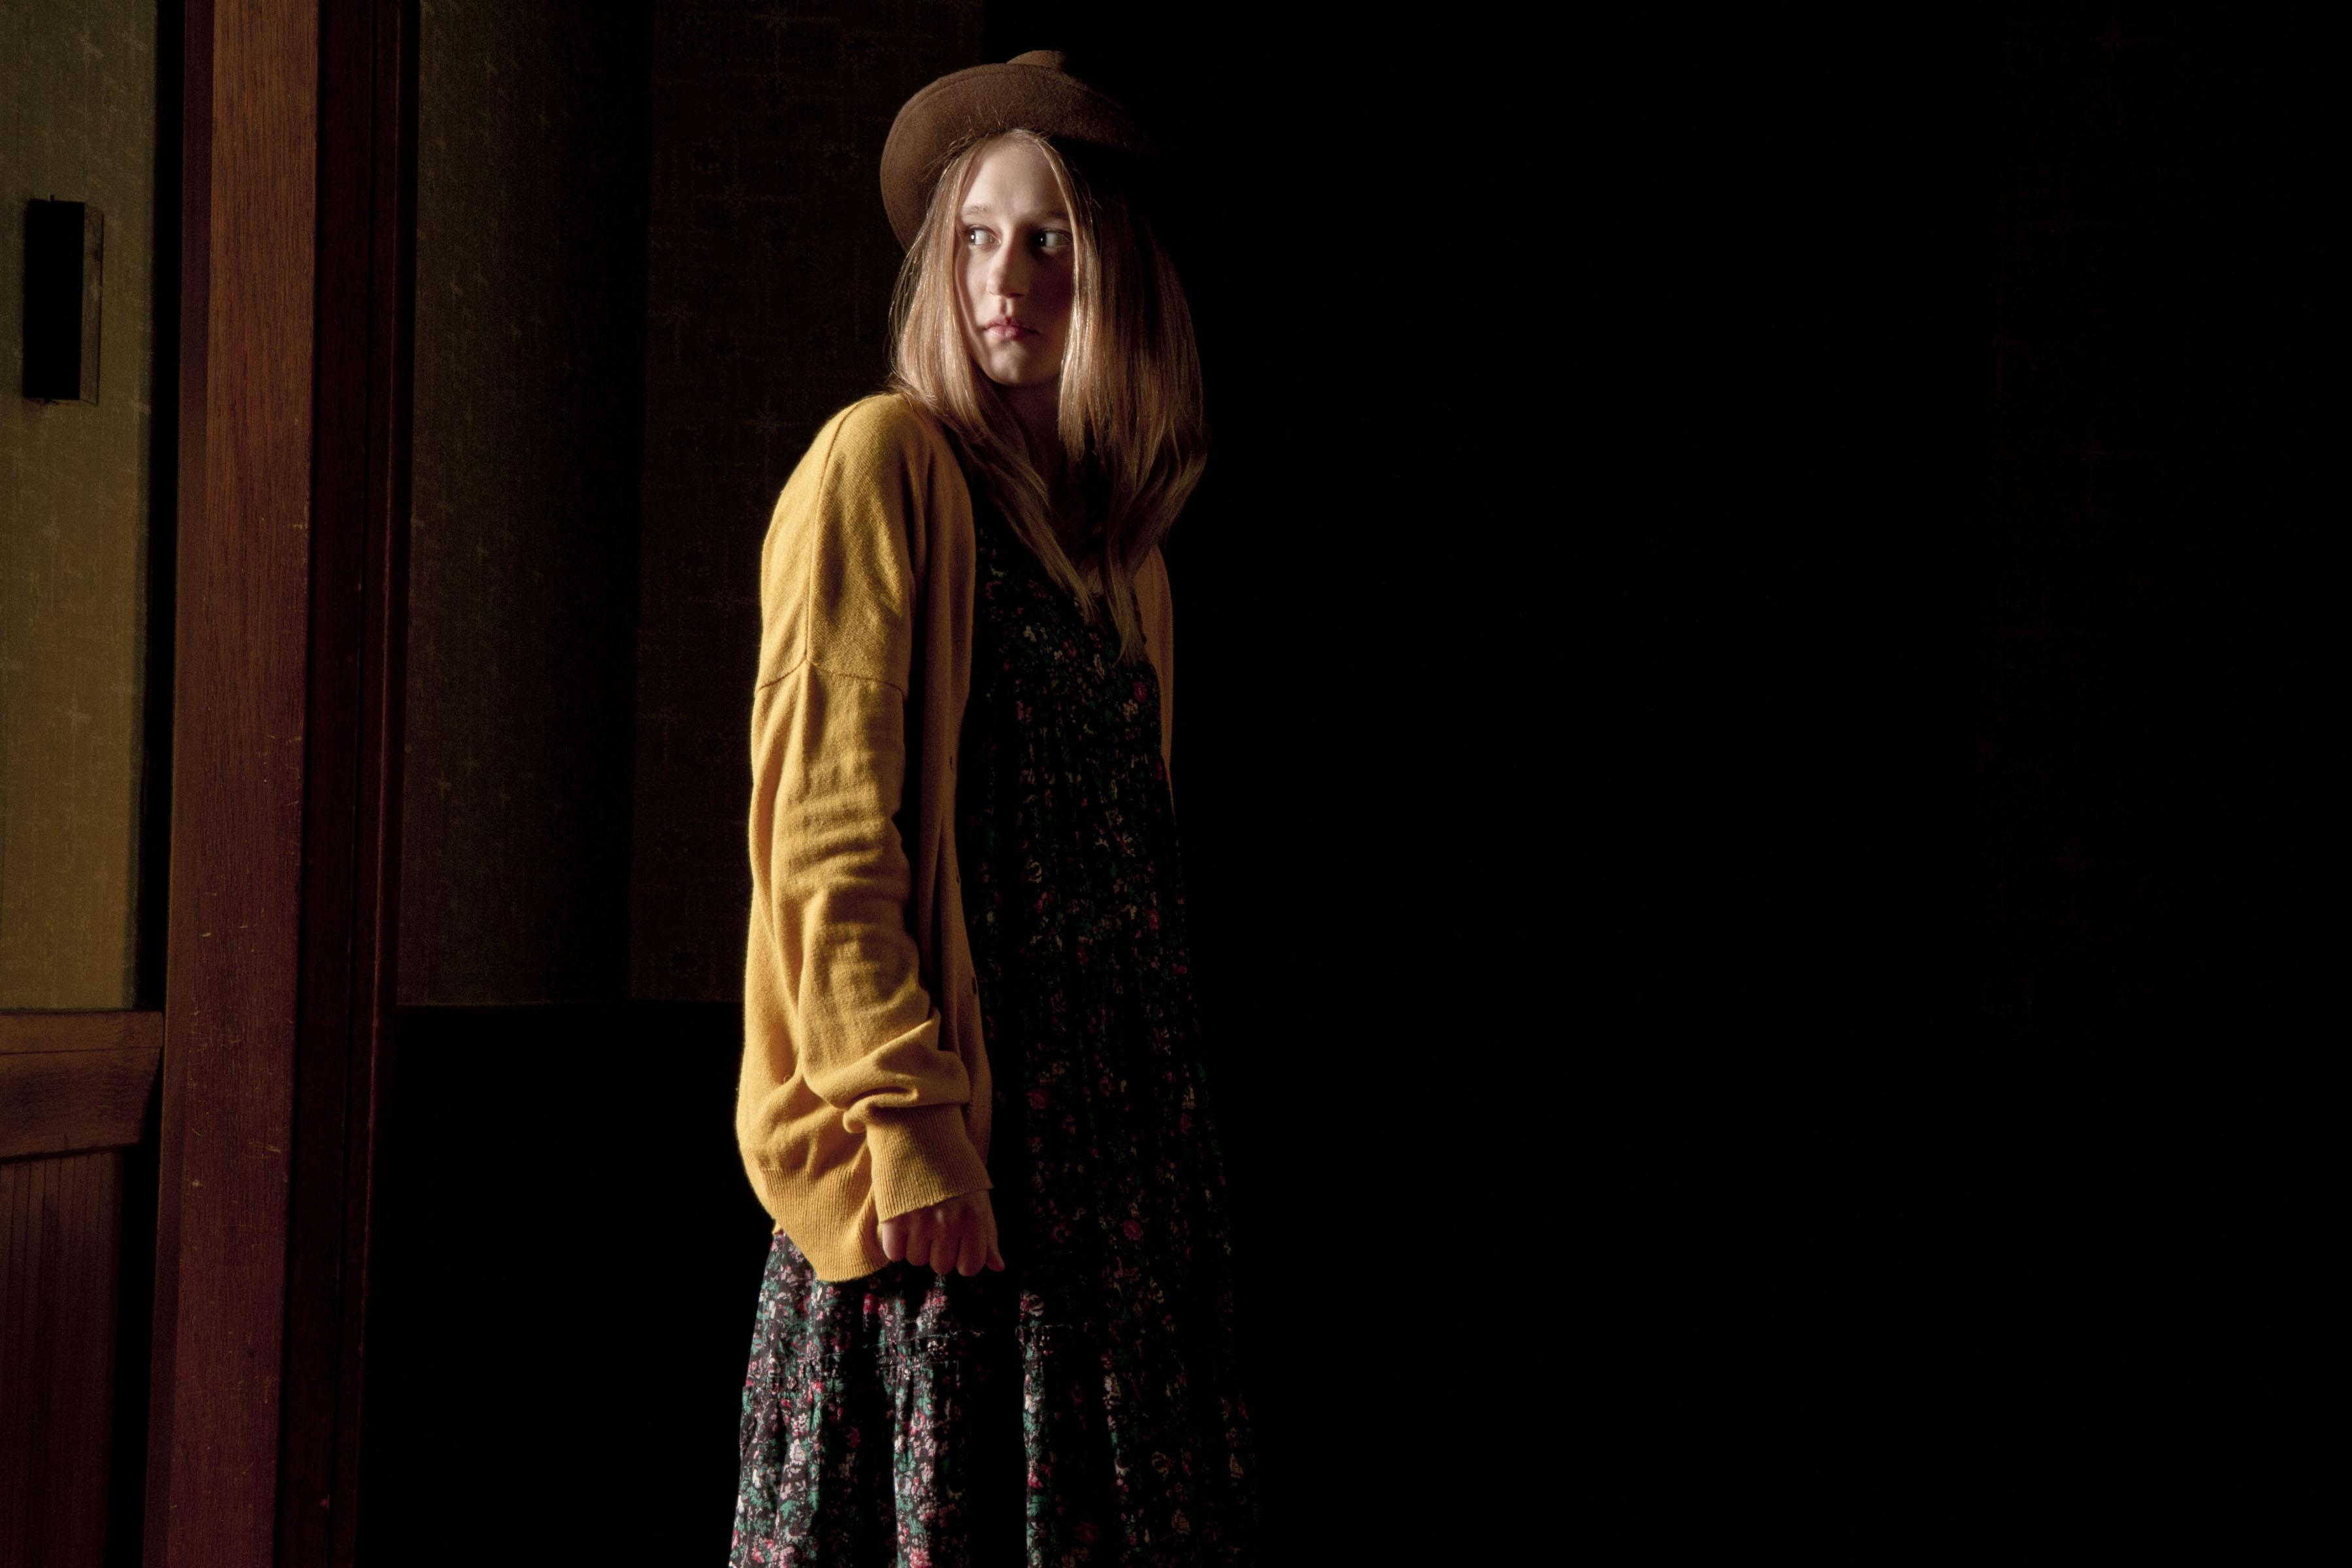 Violet Harmon/Media